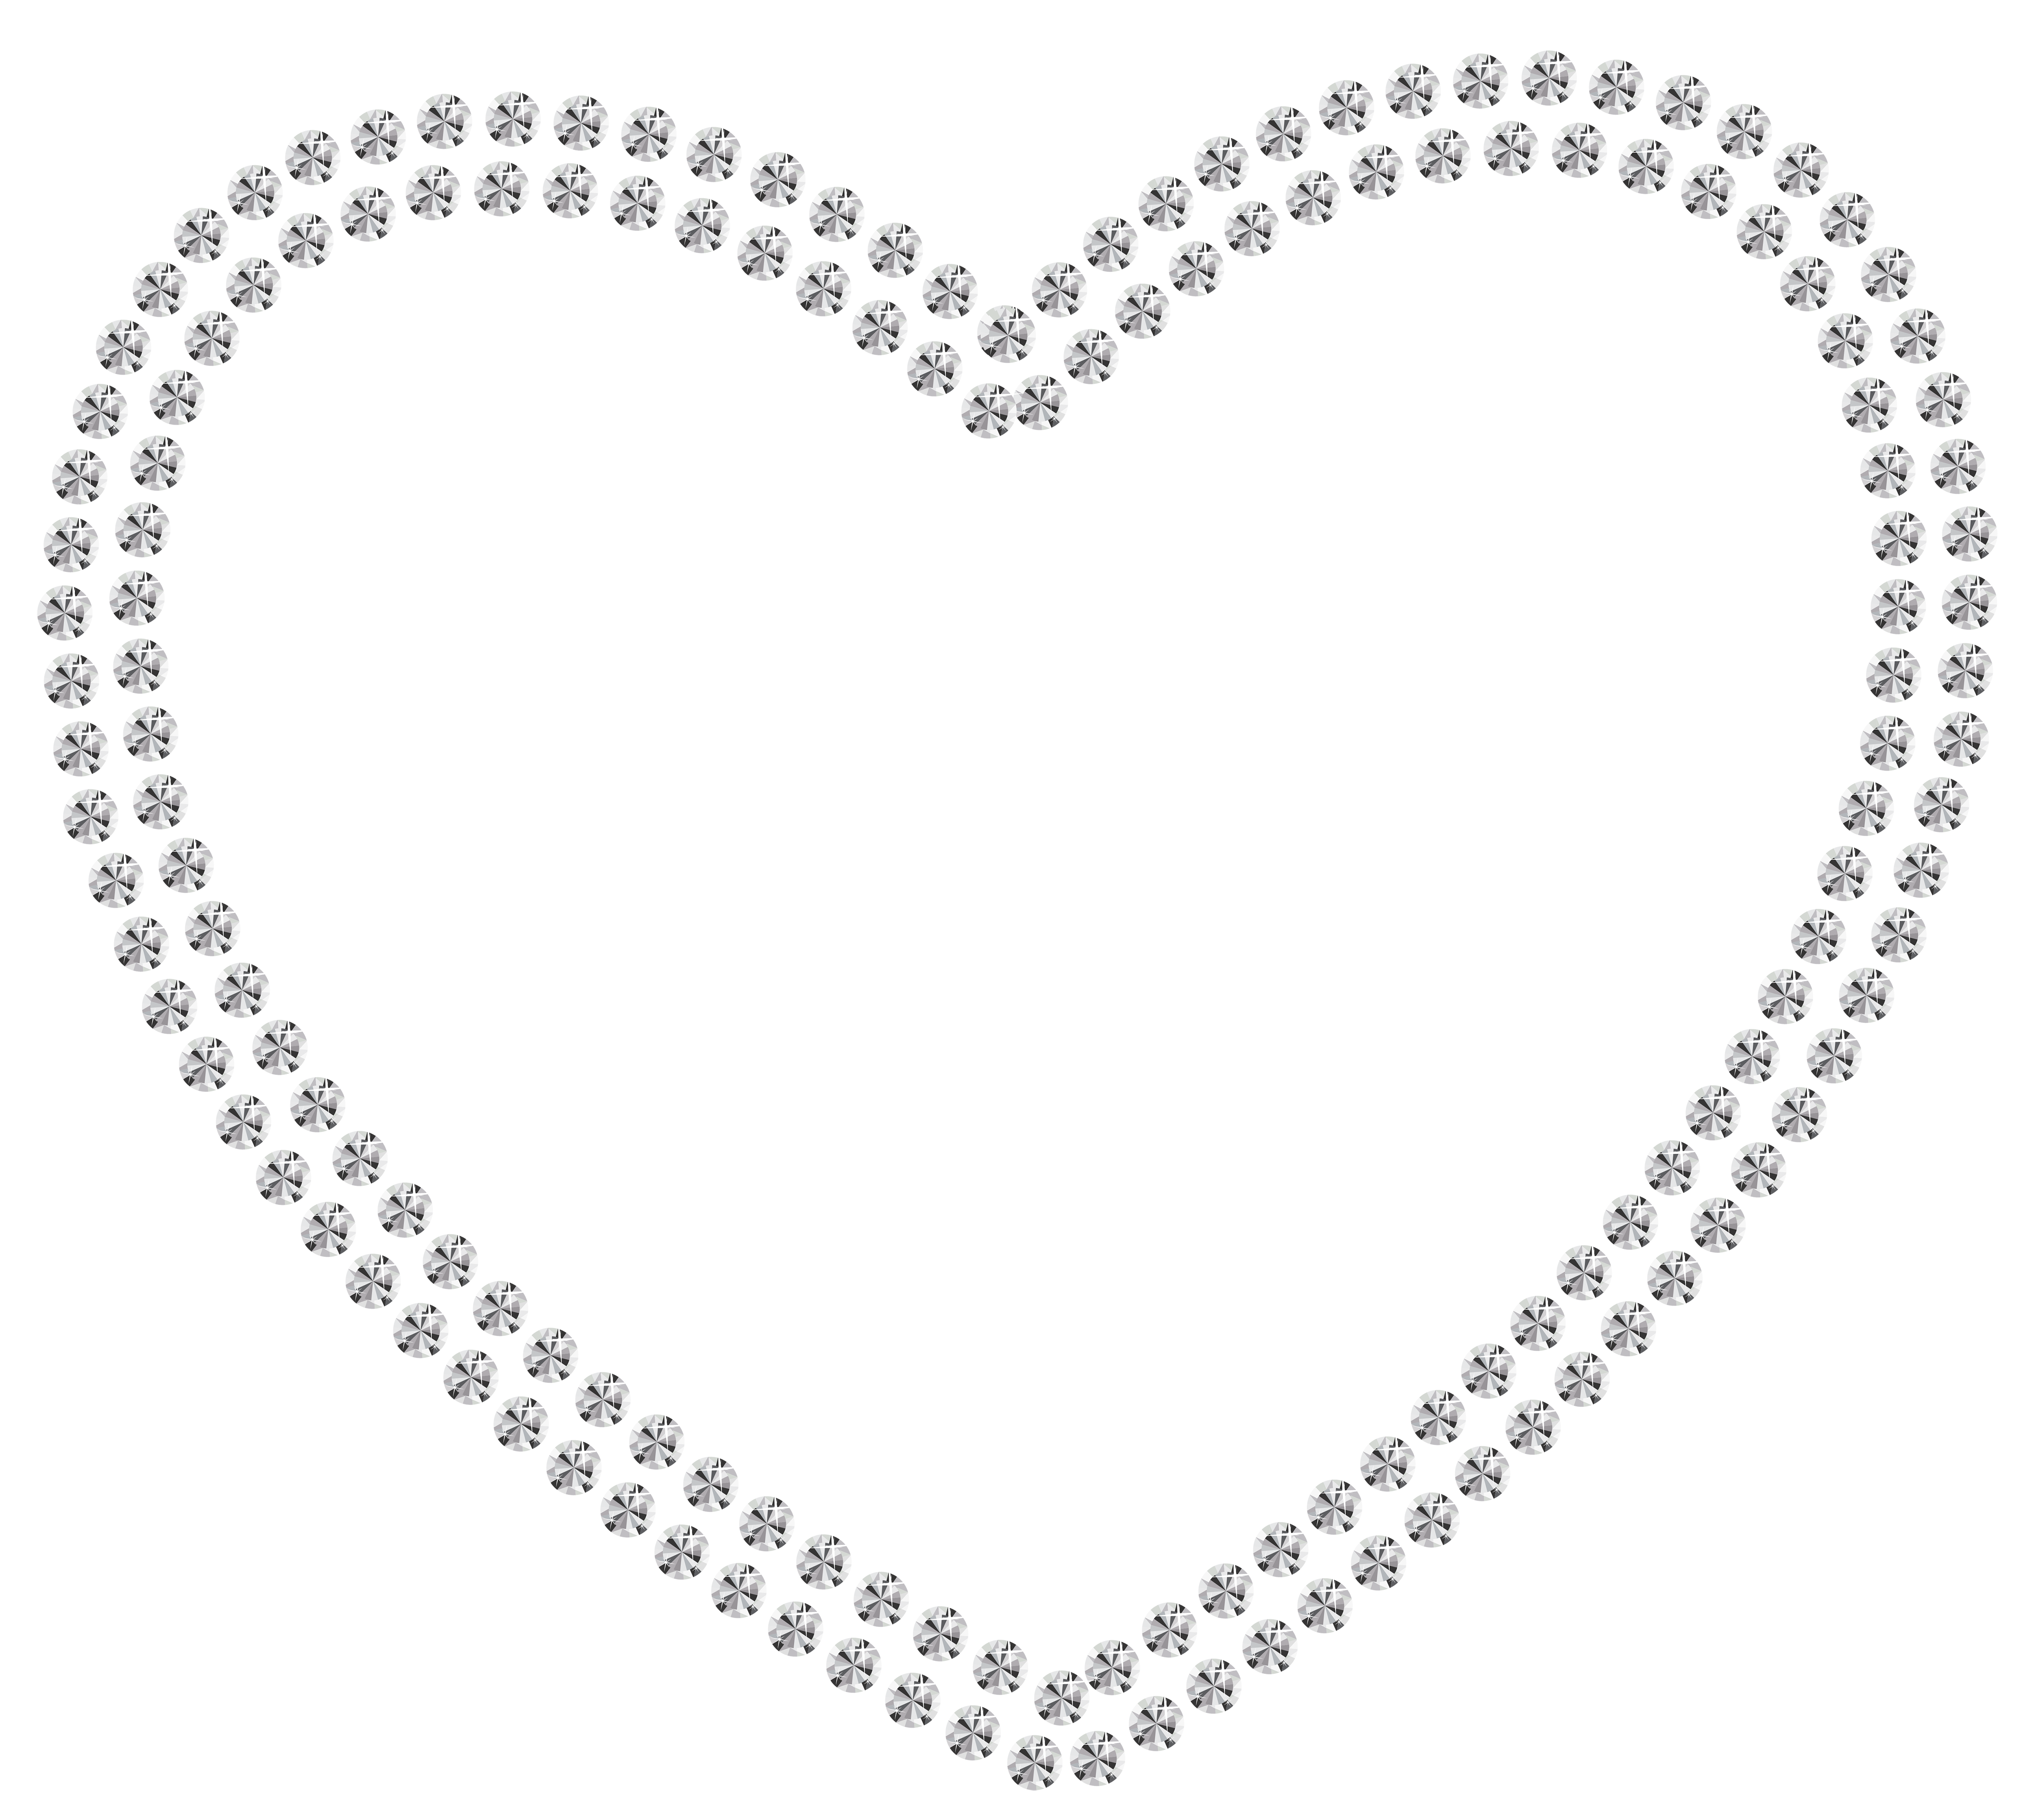 Diamond Clipart Silver Diamond 6 Diamondsclipart Jewelry Making Pearls Beach Jewelry Diy Jewelry Making Business